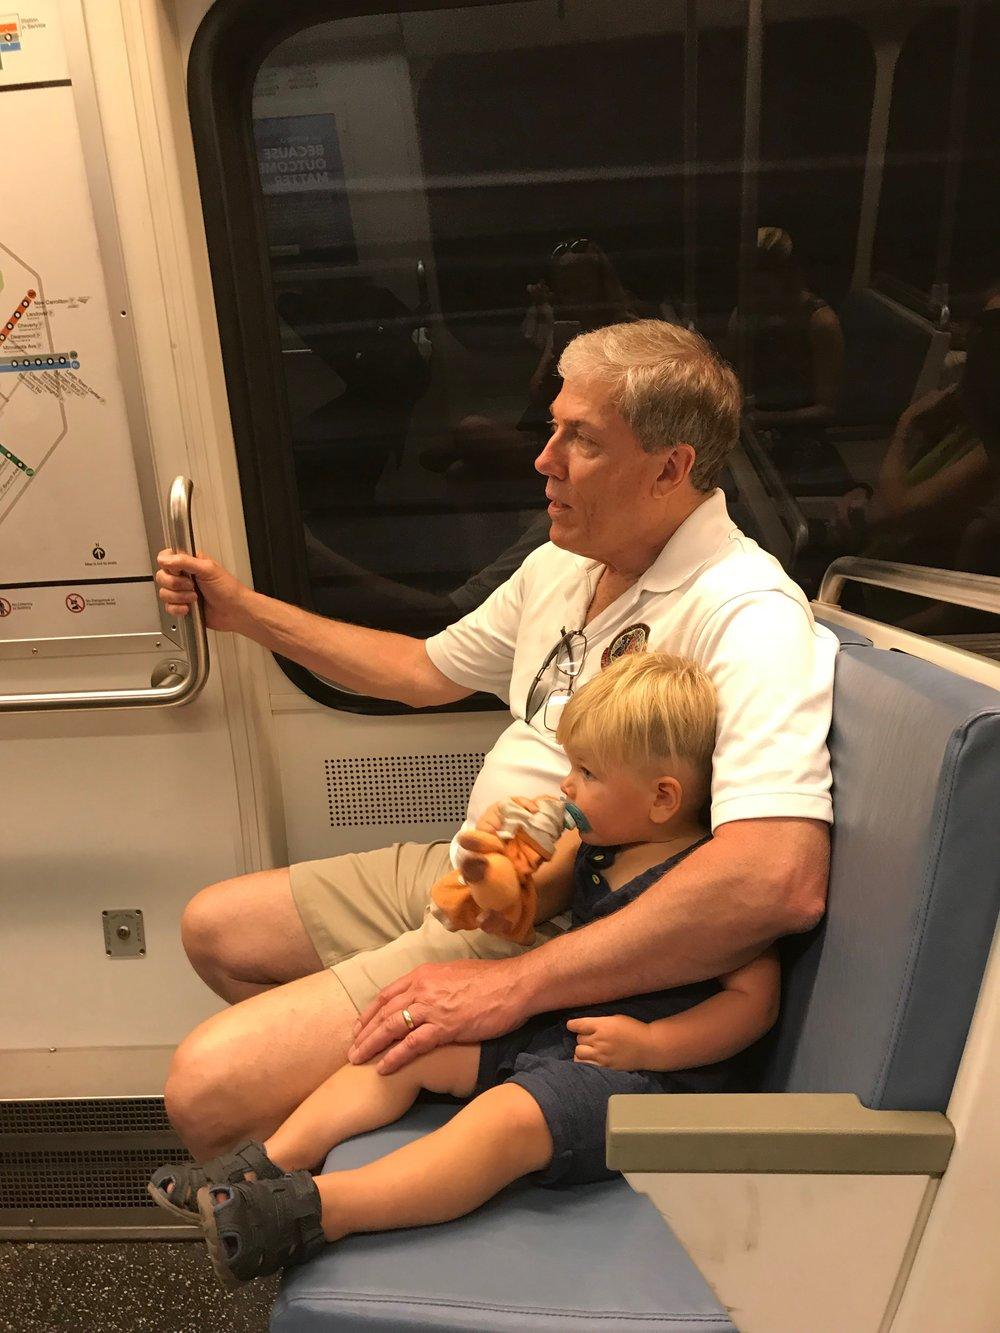 Latham riding the metro with his grandpa, pop pop